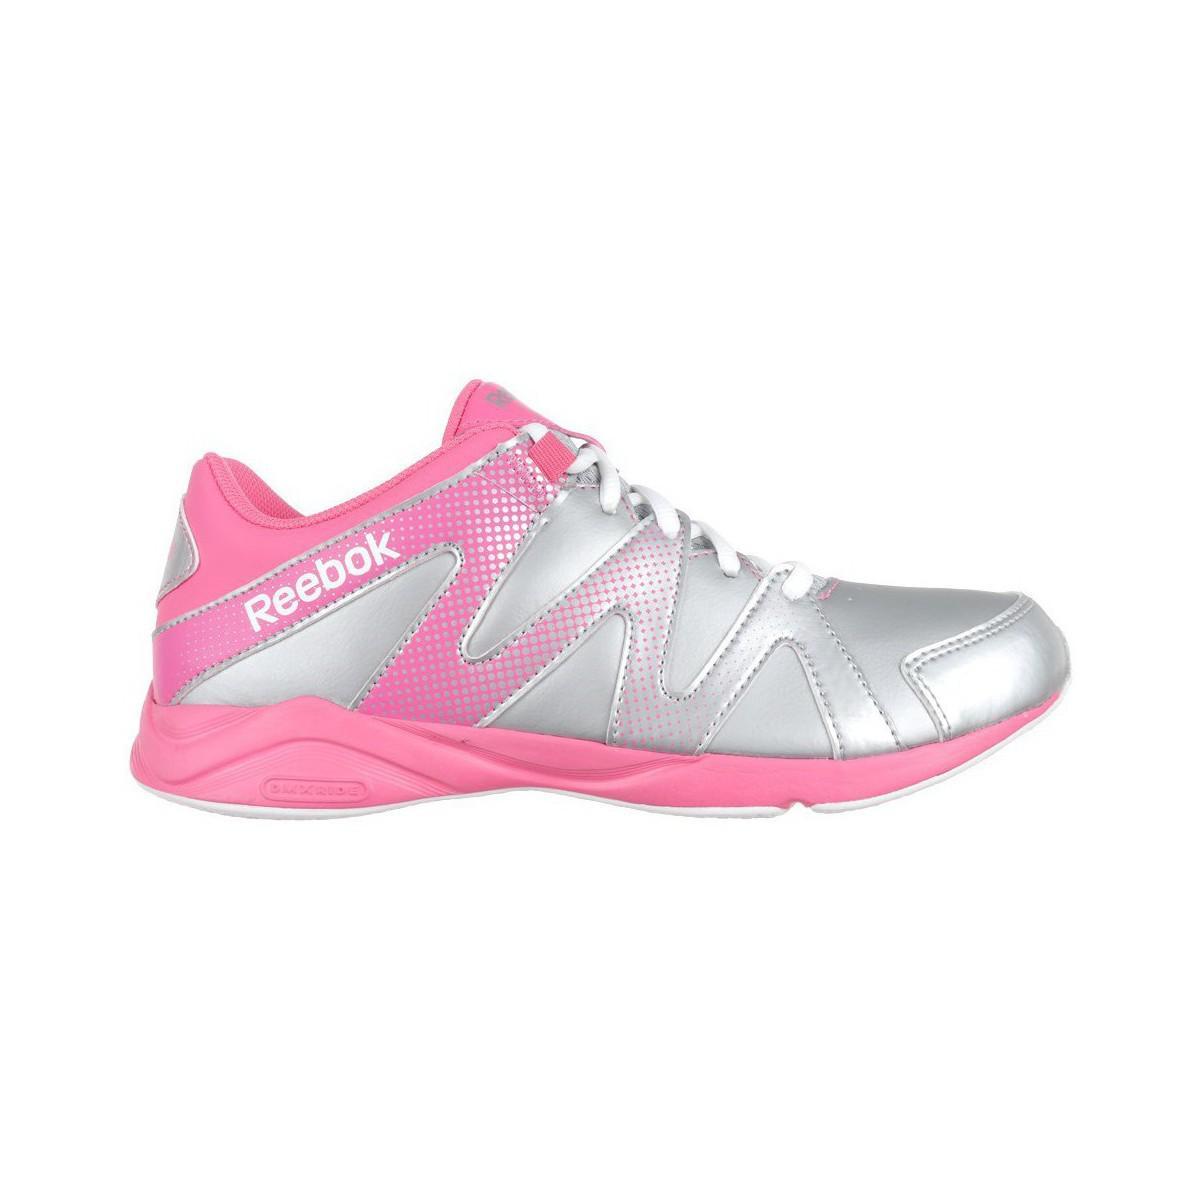 Reebok Sport Chaussures Reesculpt Trainer RS 40 Reebok Sport dil5tu8hS0